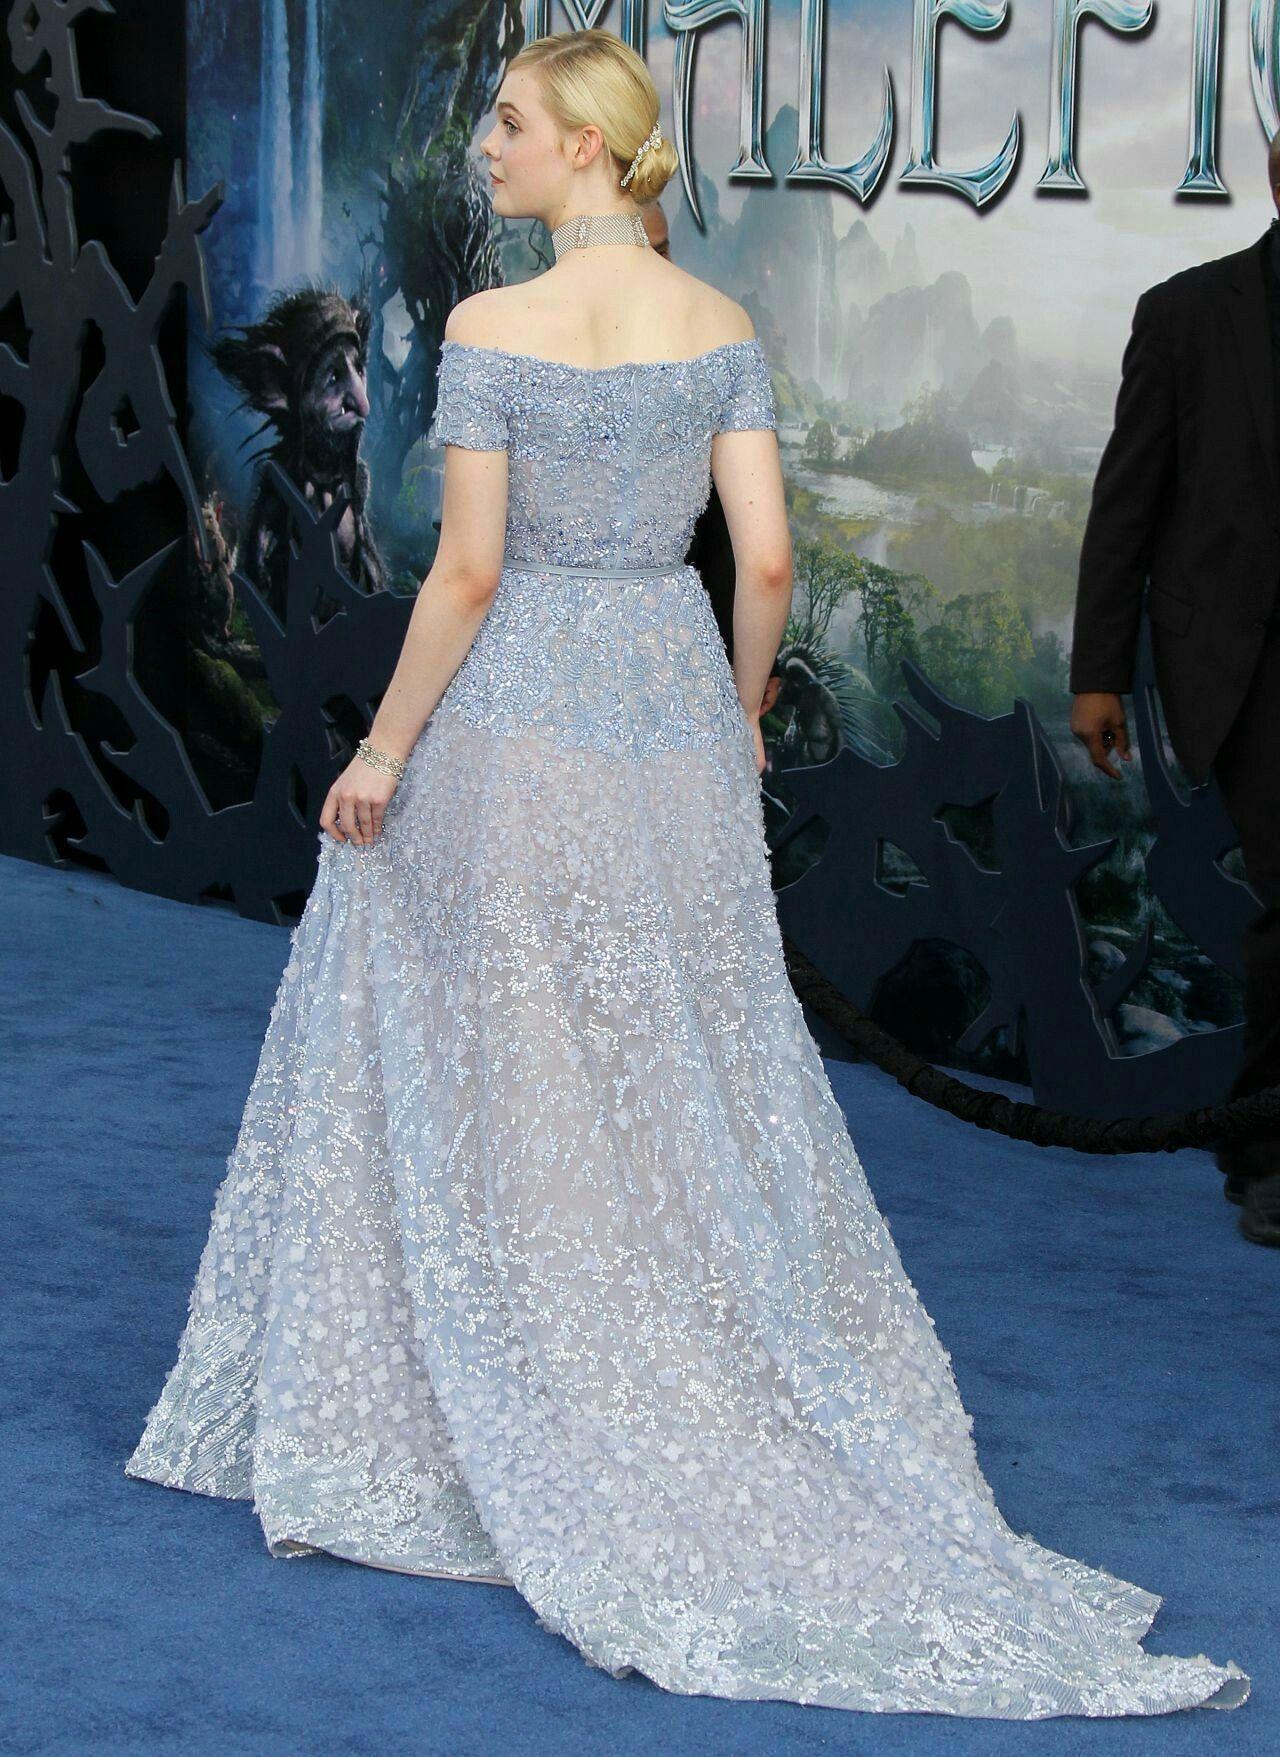 Elle Fanning Maleficent World Premiere In Los Angeles